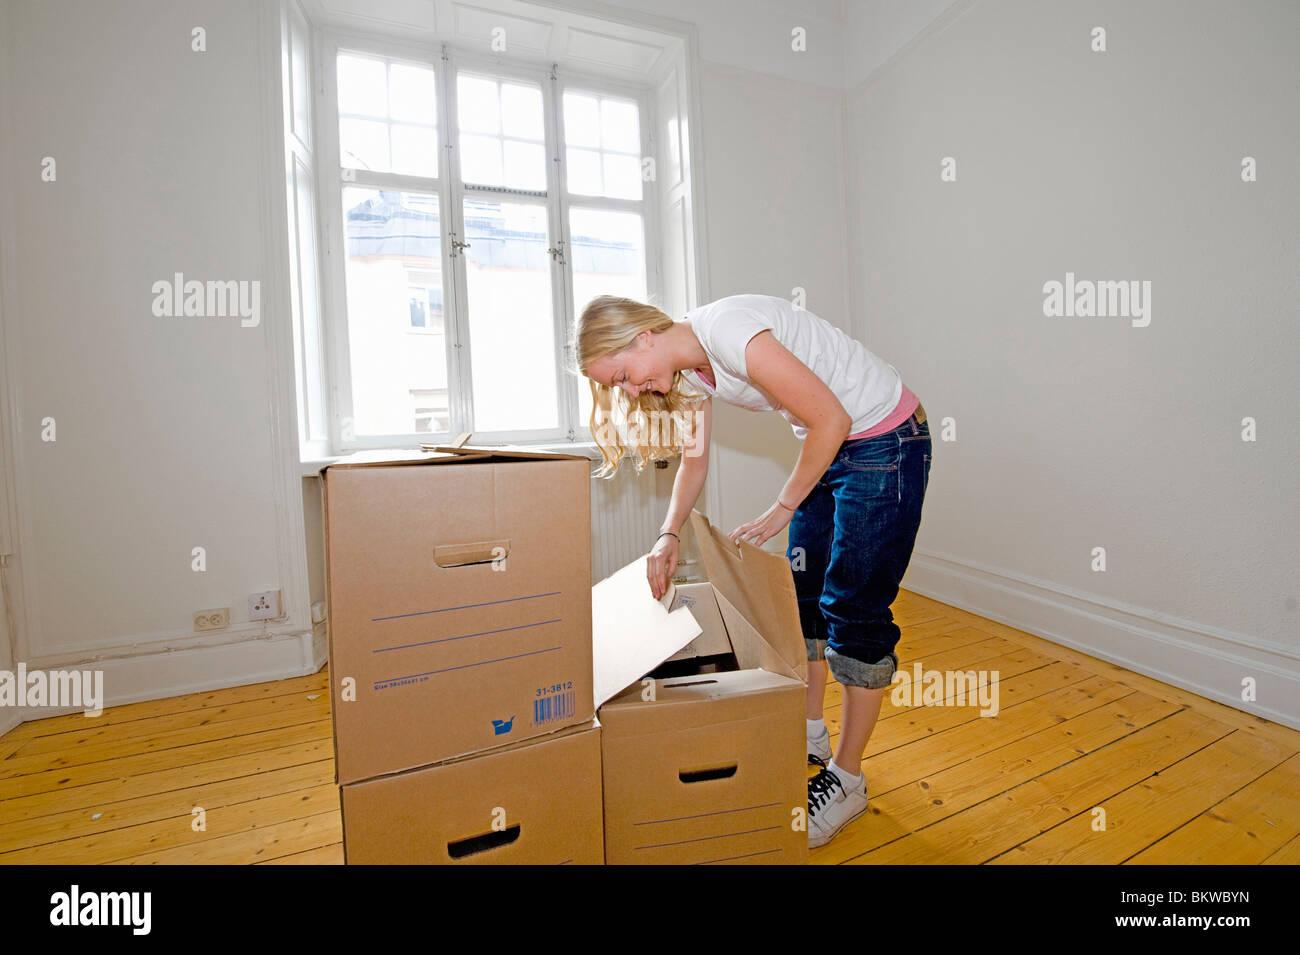 Woman looking inside box - Stock Image